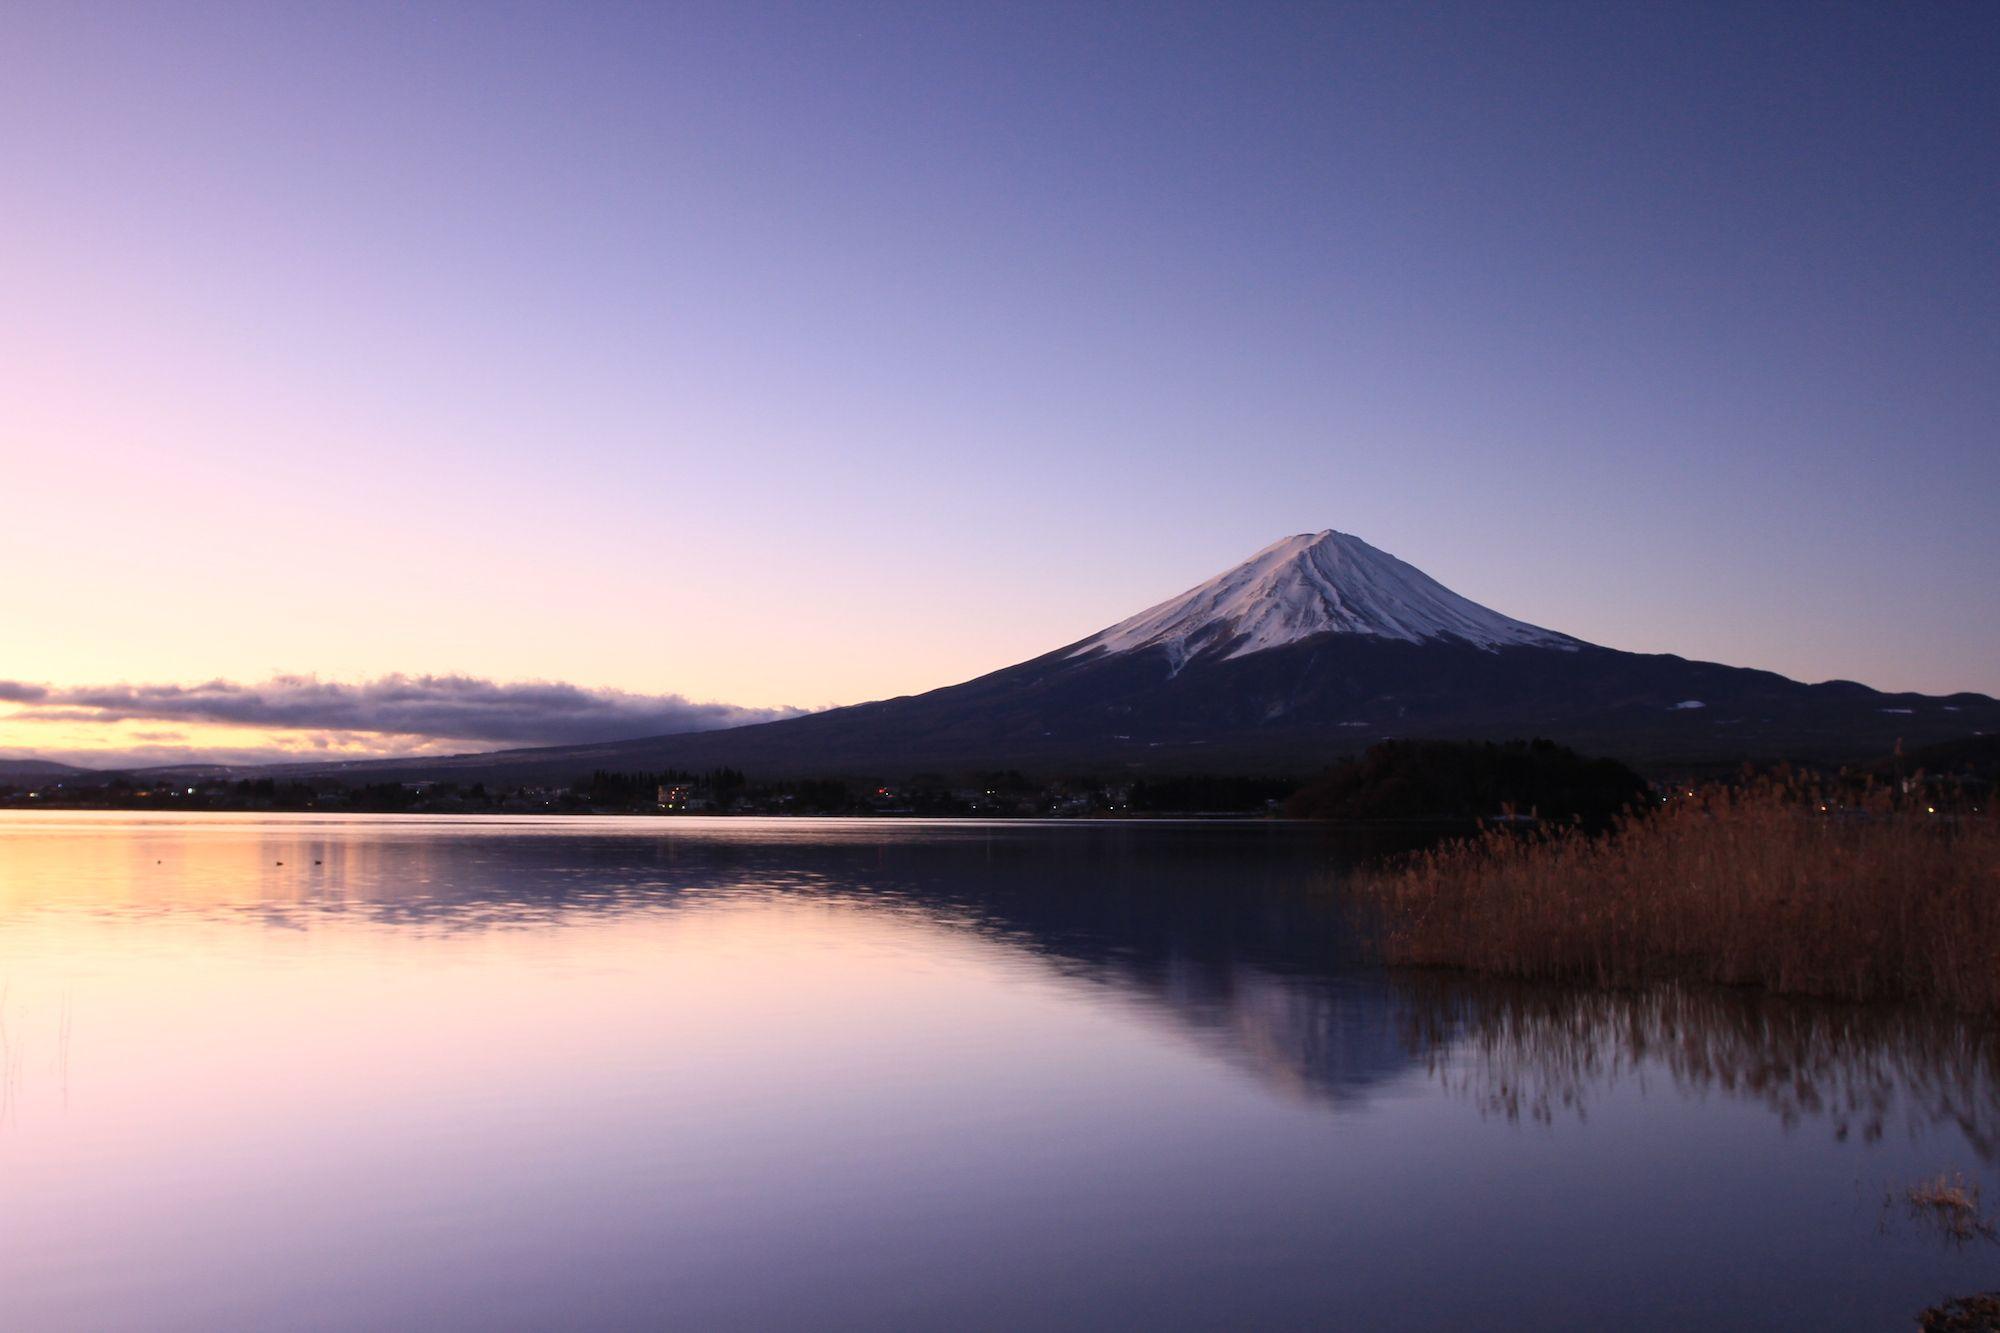 Photo by : Naoyuki Suzuki . Follow us for amazing posts! #PASHADELIC #FUJIdelic . . #canon_photos #eos7d #mtfuji #fujiyama #fujisan #photography #photooftheday #nature #naturephotography #landscape #landscapephotography #japan #japan_of_insta #japanphoto #igers #ig_japan #mountain #mountains #mountainphotography #富士山 #富士 #山